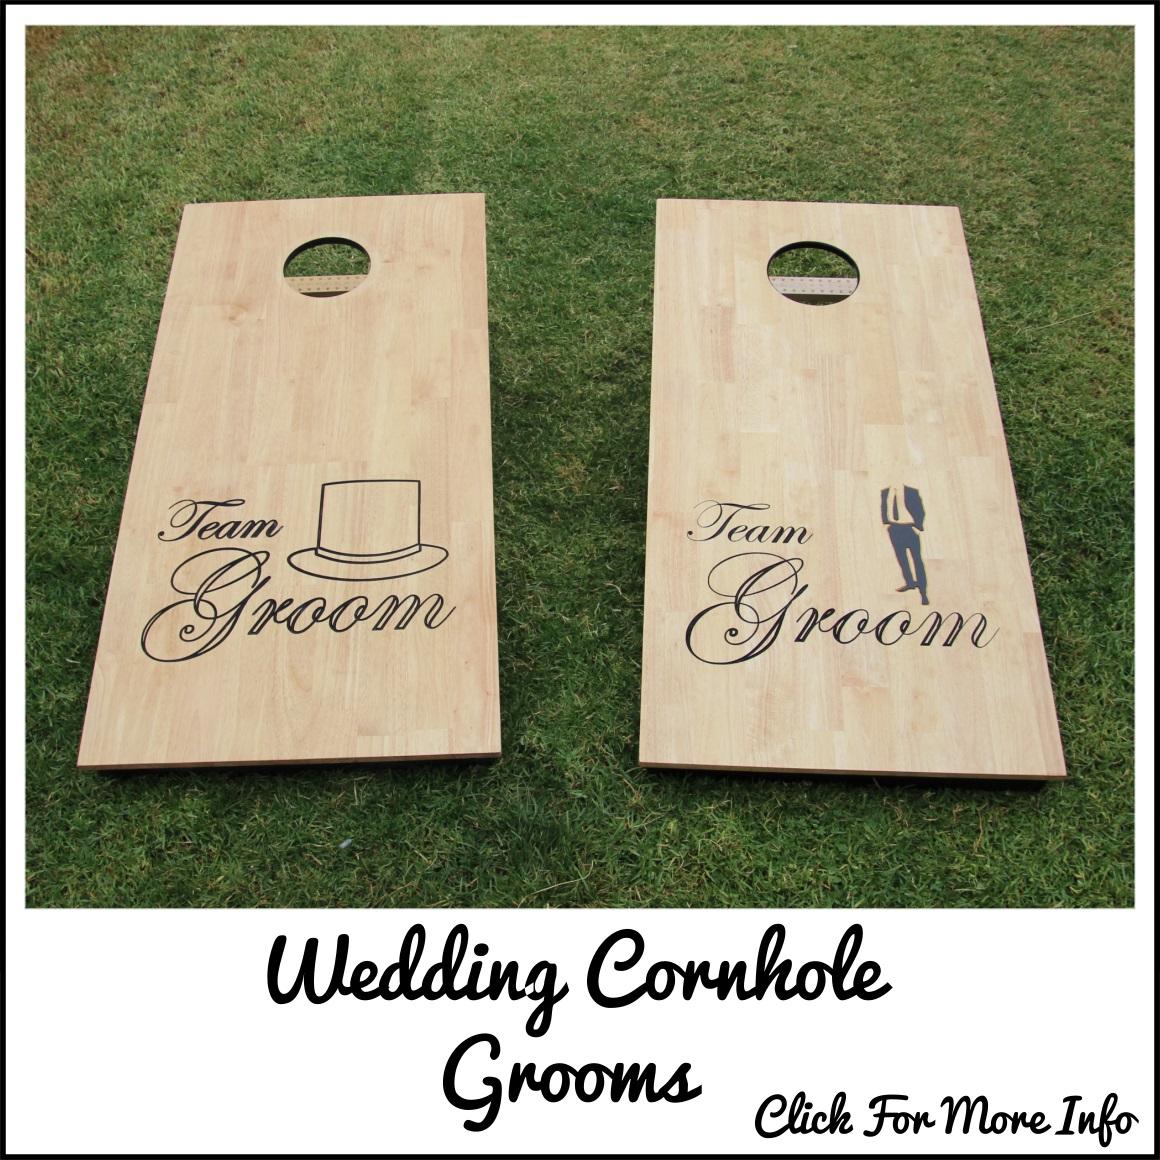 Cornhole Grooms